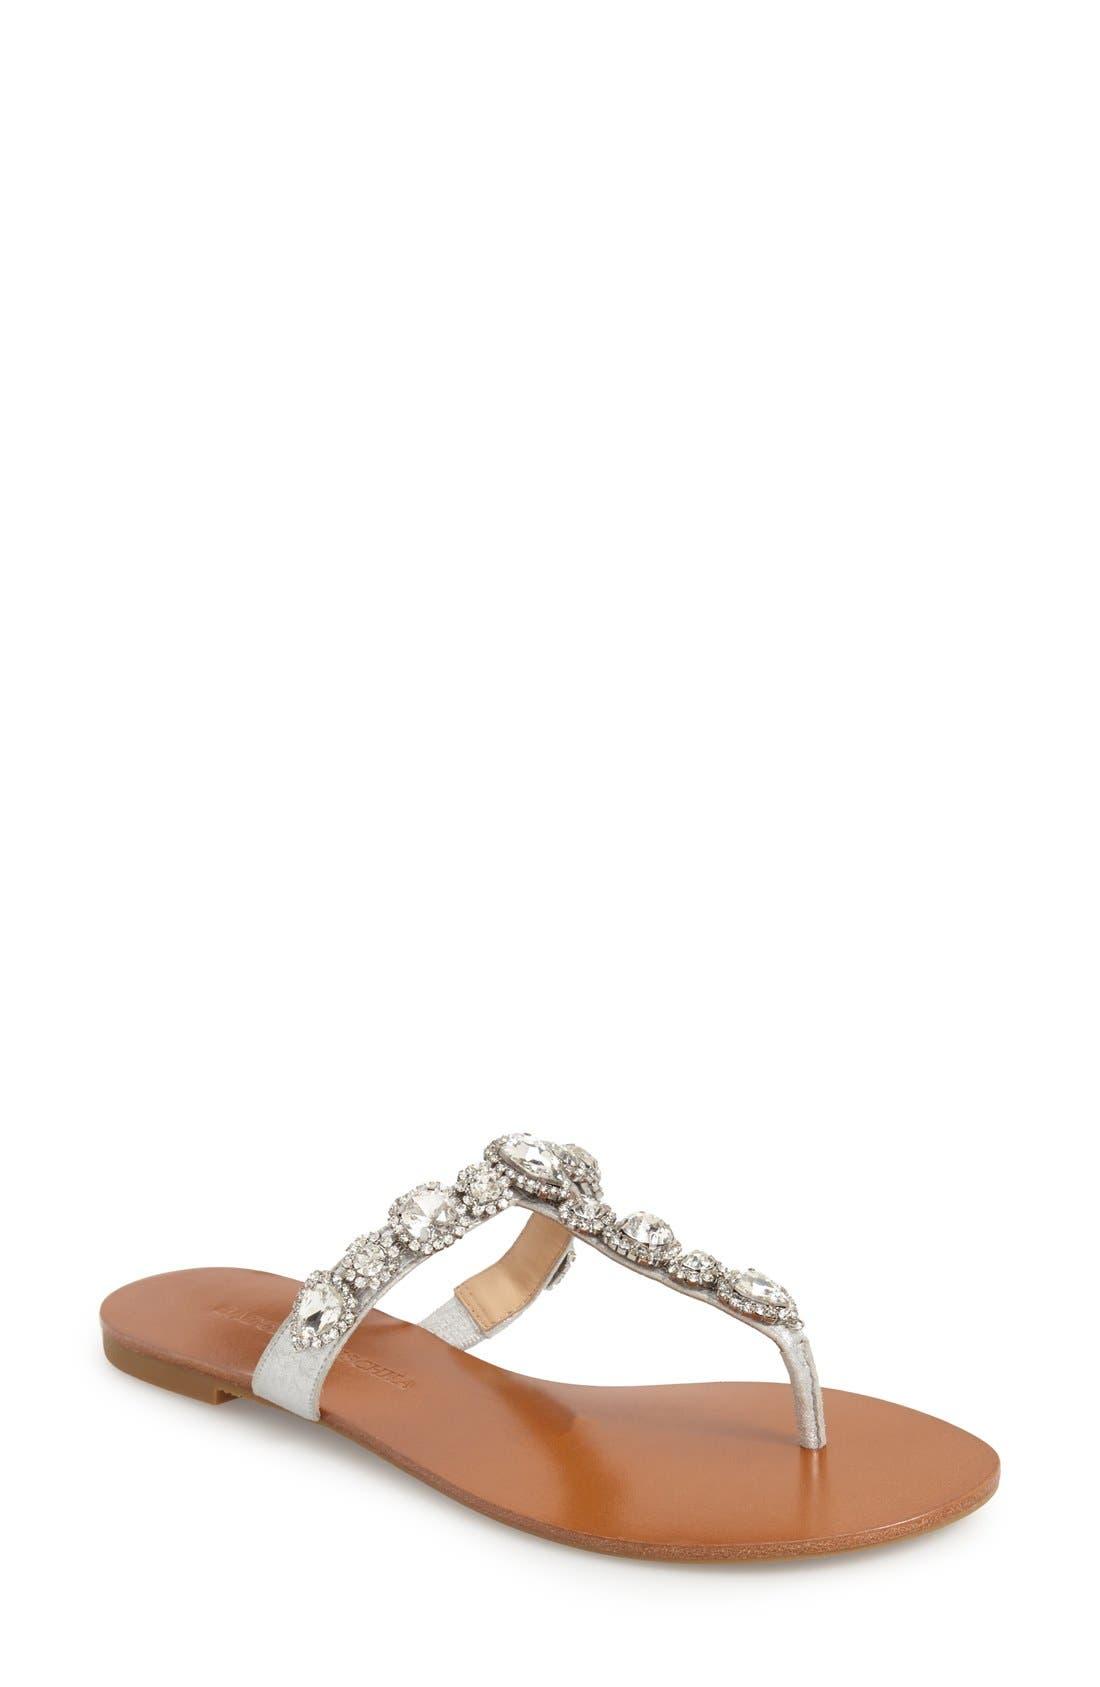 Alternate Image 1 Selected - Badgley Mischka 'Cliche' Embellished Flat Sandal (Women)